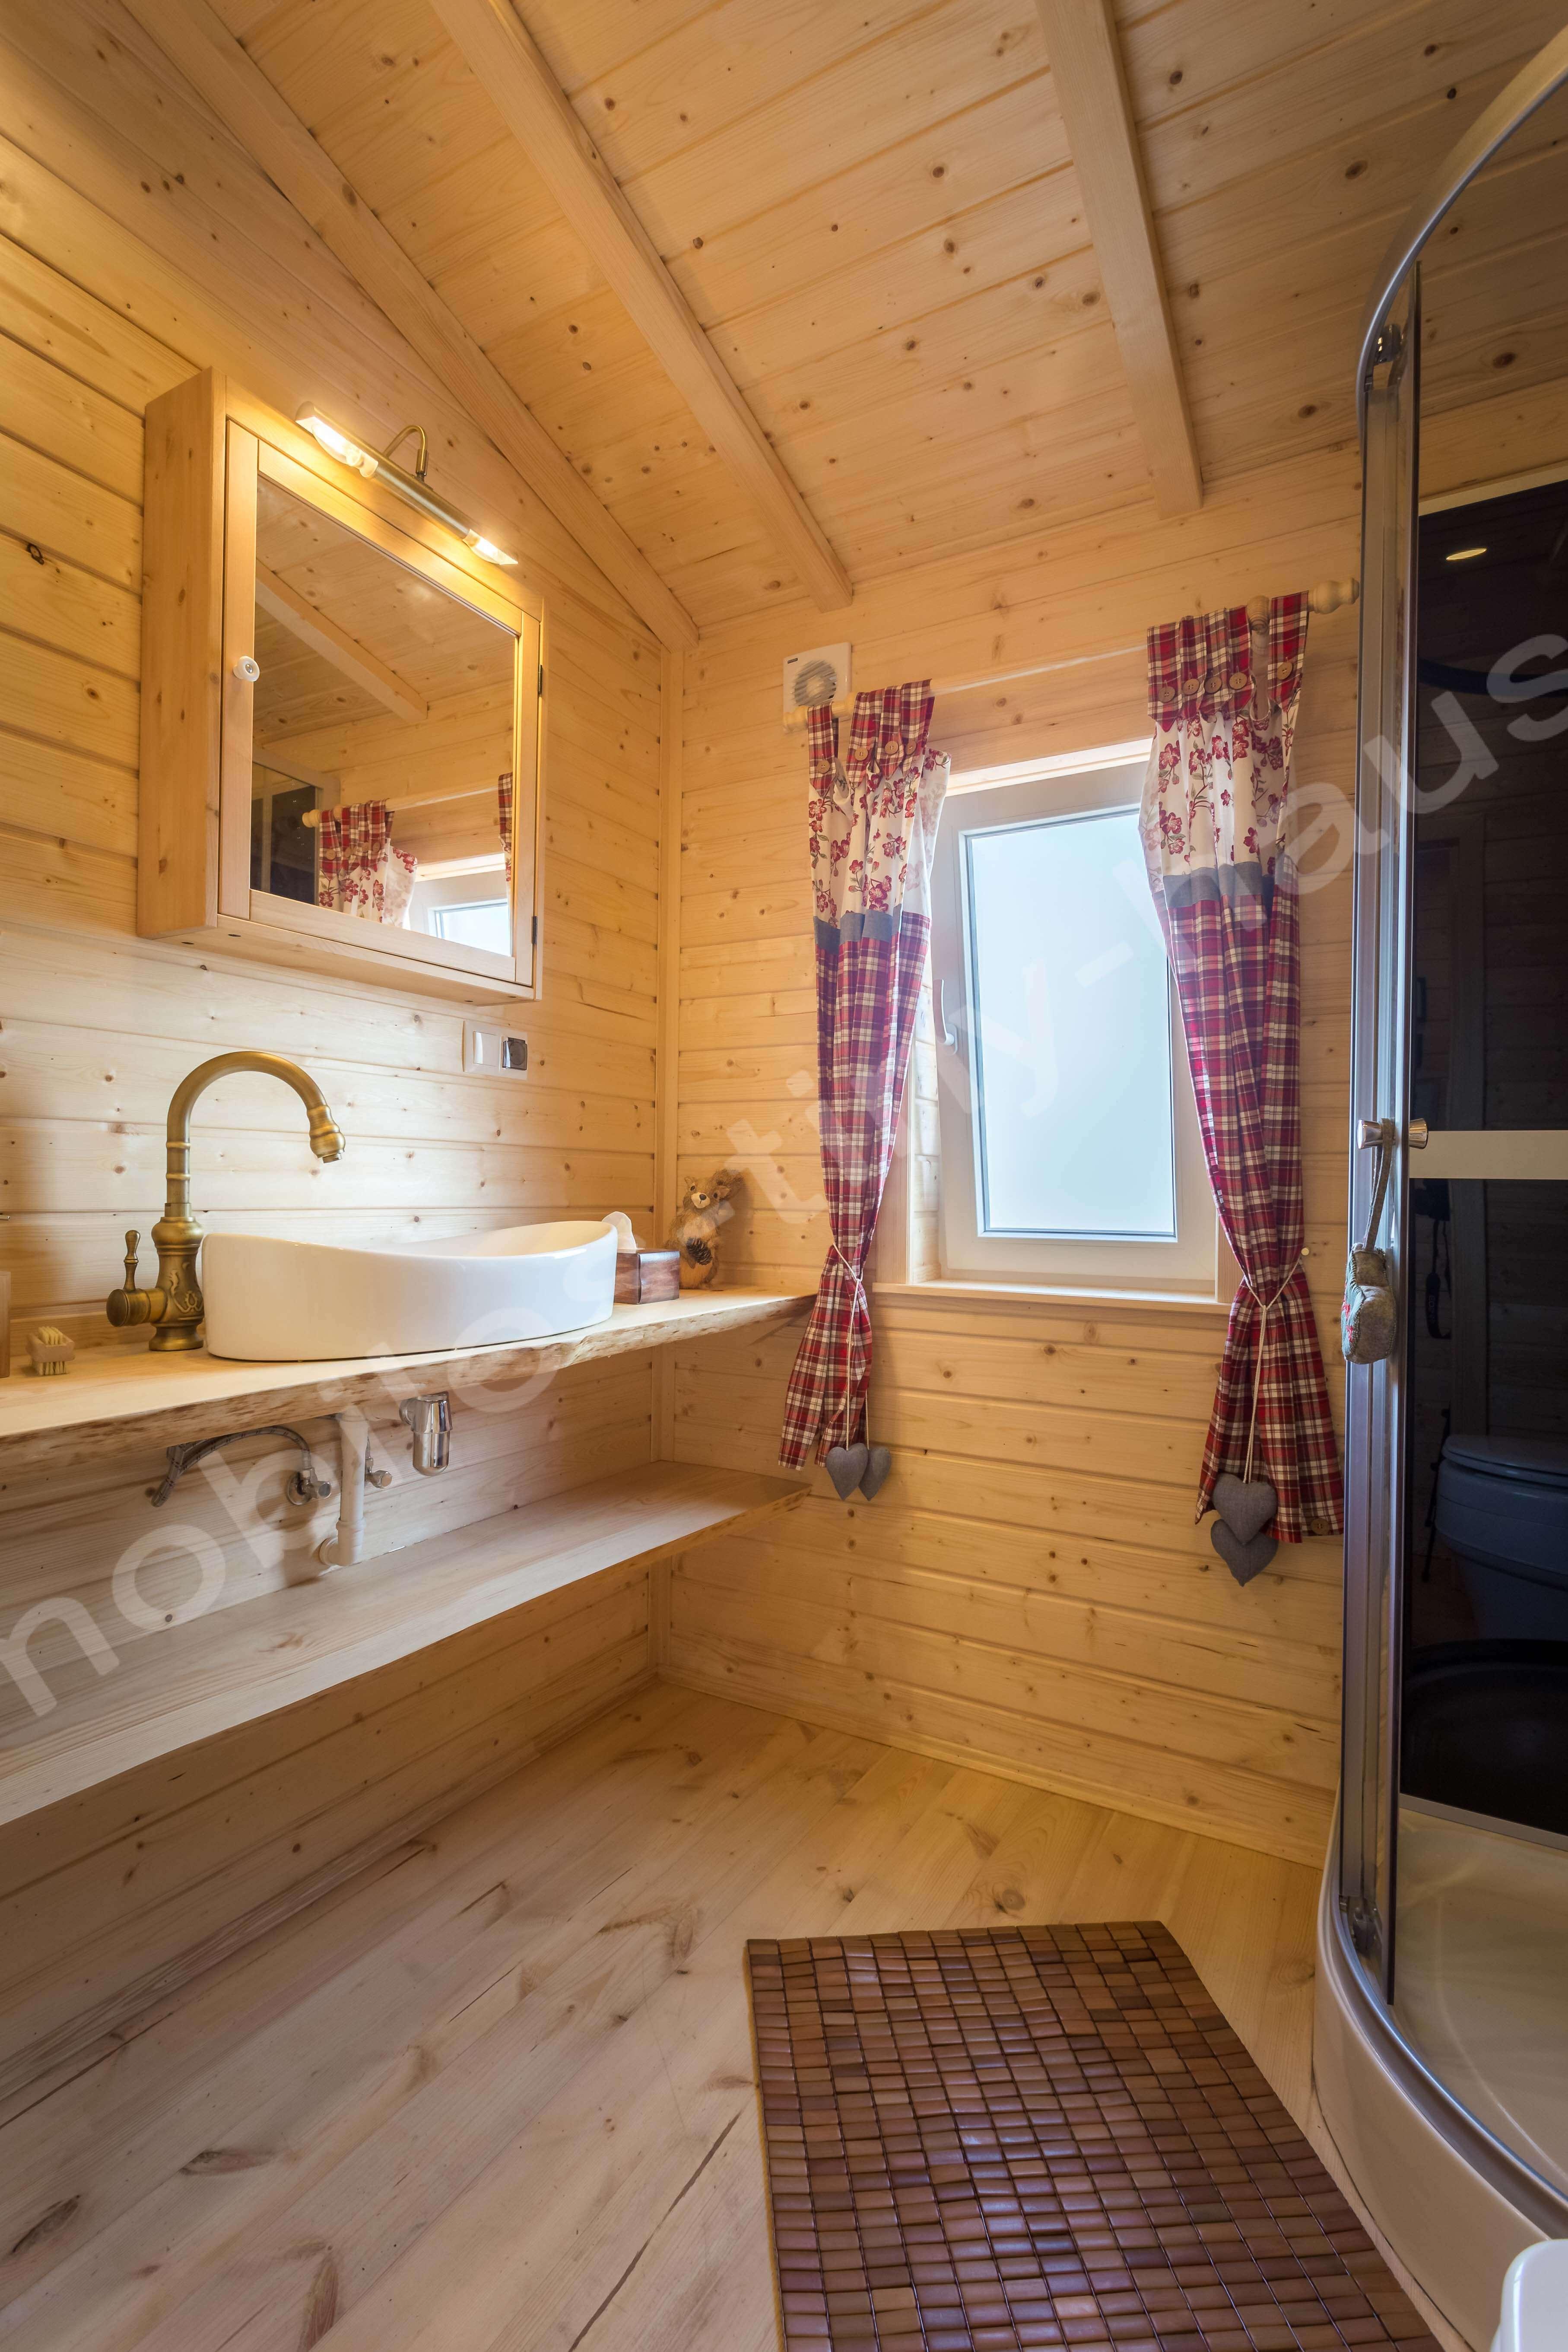 mobilheim sterreich innen mobiles tiny haus. Black Bedroom Furniture Sets. Home Design Ideas